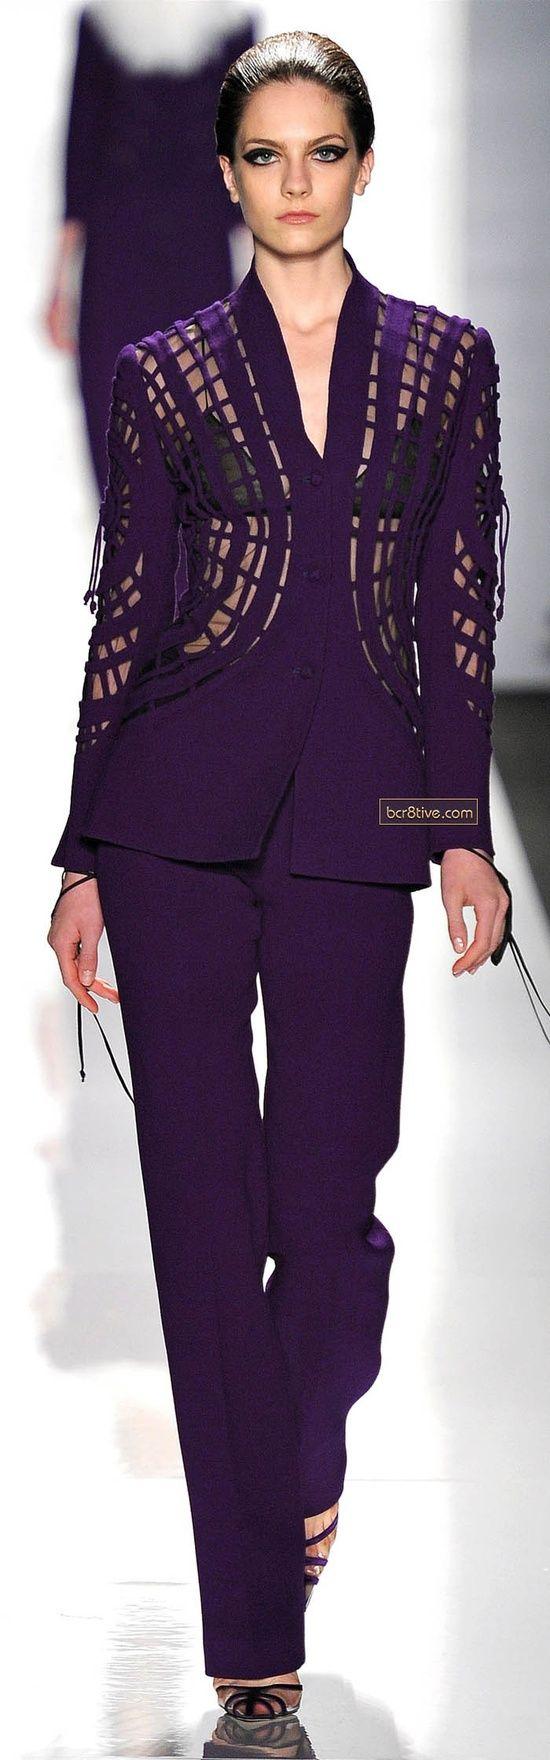 fashion runway 2013-2014 fashion runway 2013-2014 fashion runway 2013-2014